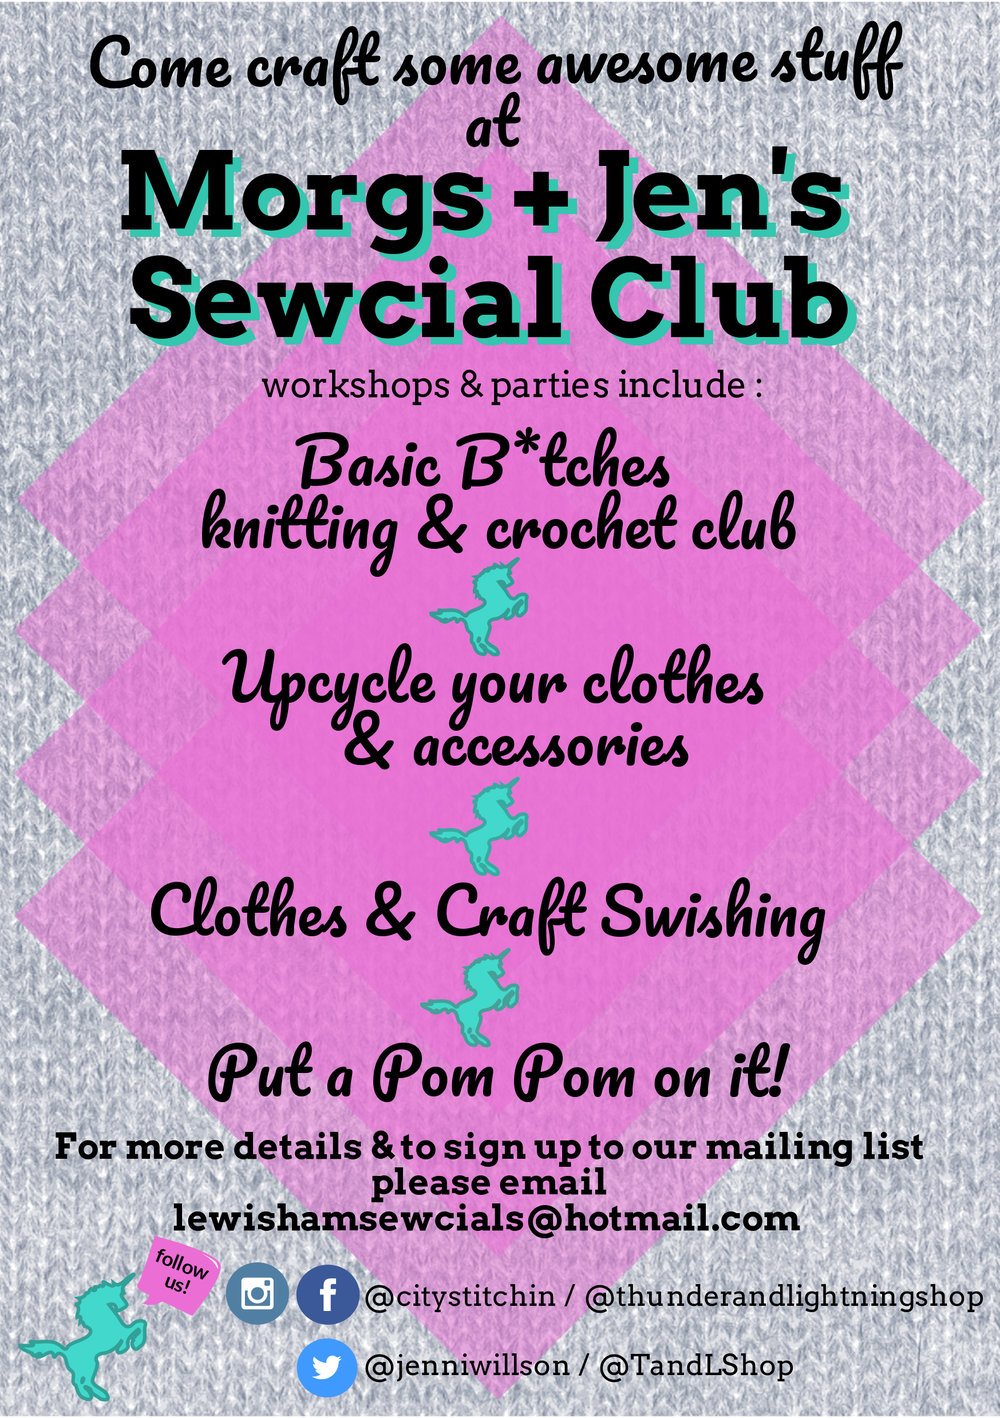 Morgs & Jen's Sewcial Club